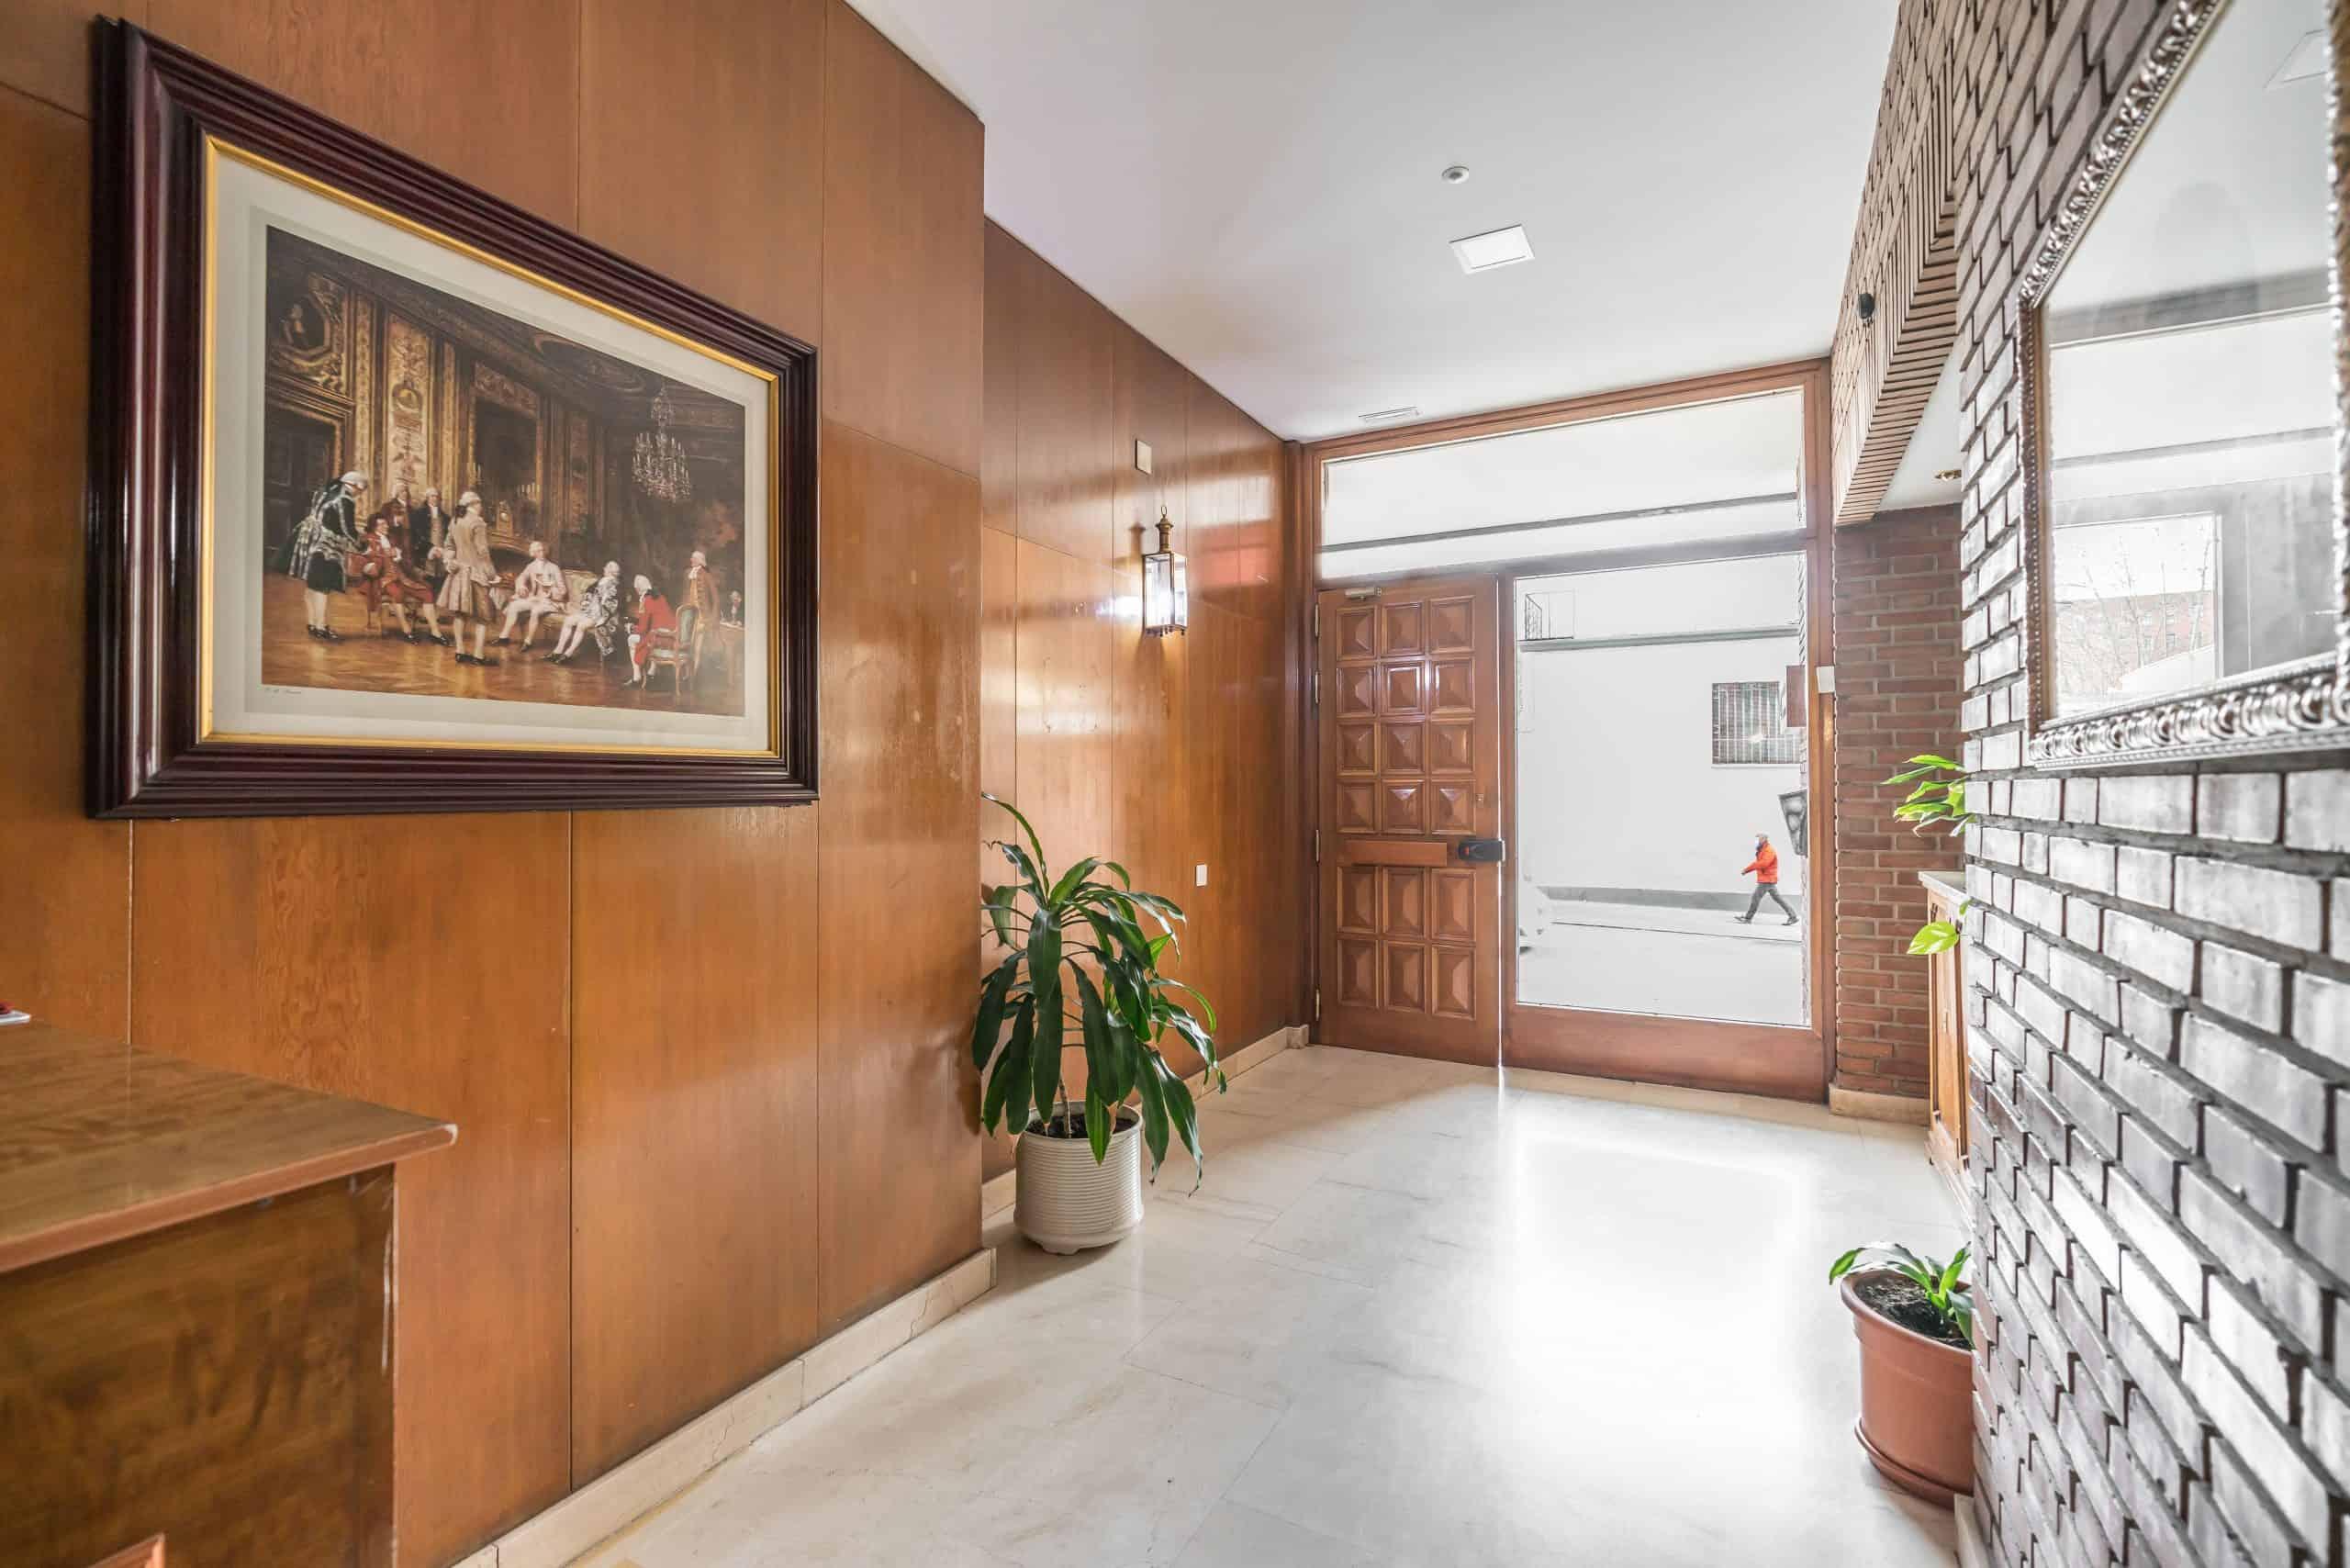 Agencia Inmobiliaria de Madrid-FUTUROCASA-Zona ARGANZUELA-LEGAZPI -calle Modesto Lafuente 41,1ºC Zonas comunes 1